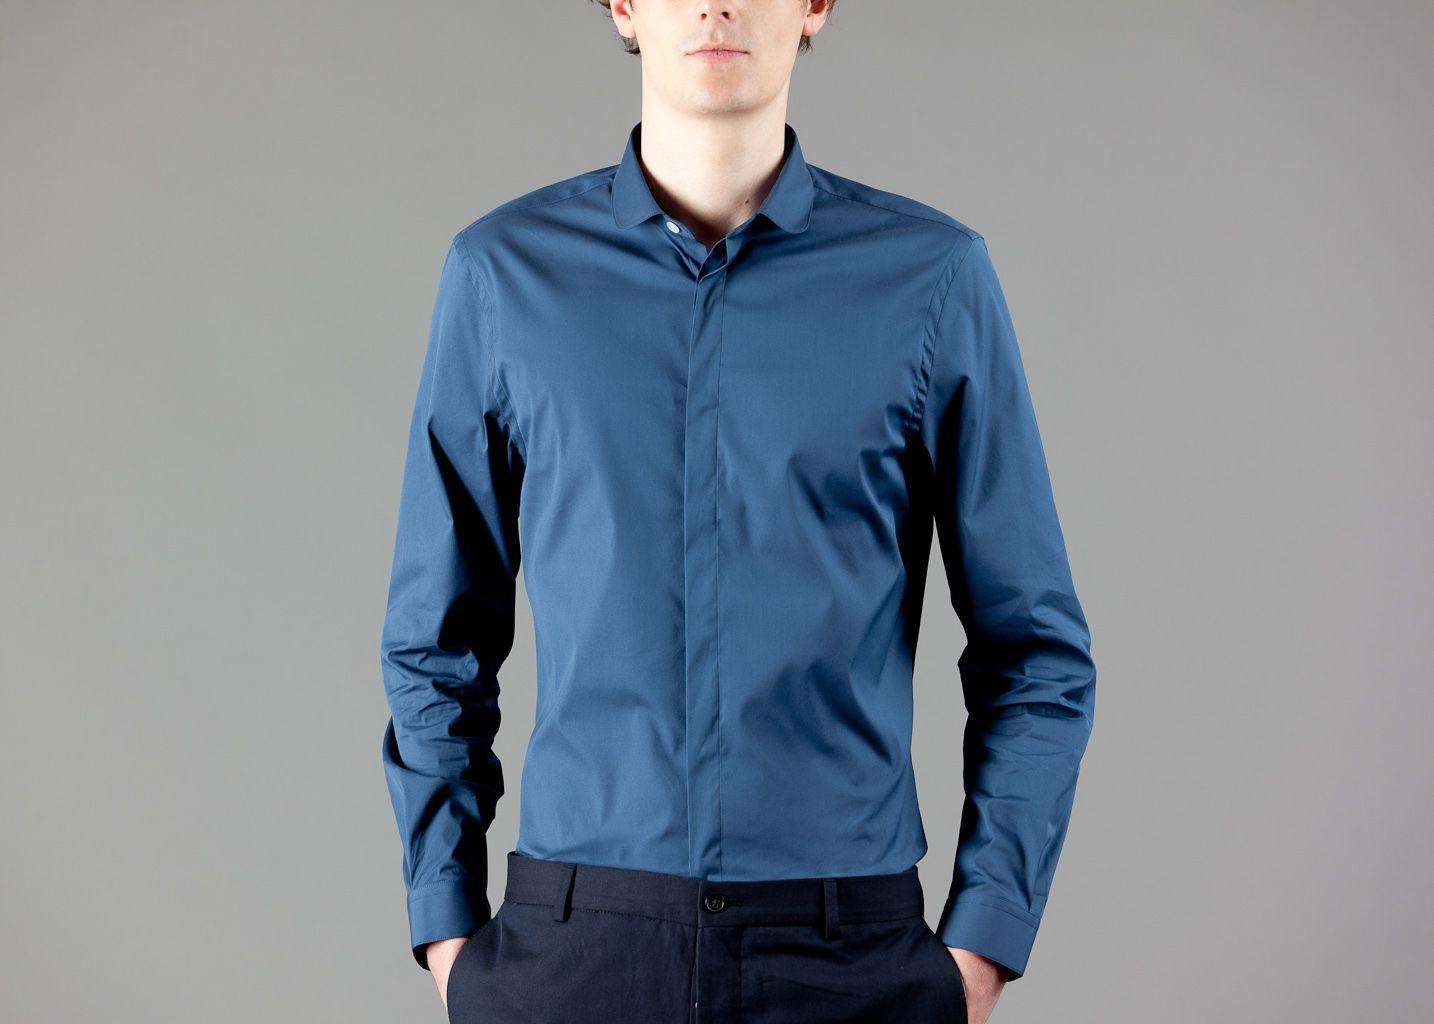 new style 30536 669be 1118902128-06BL-schoepfer-chemise-01.jpg